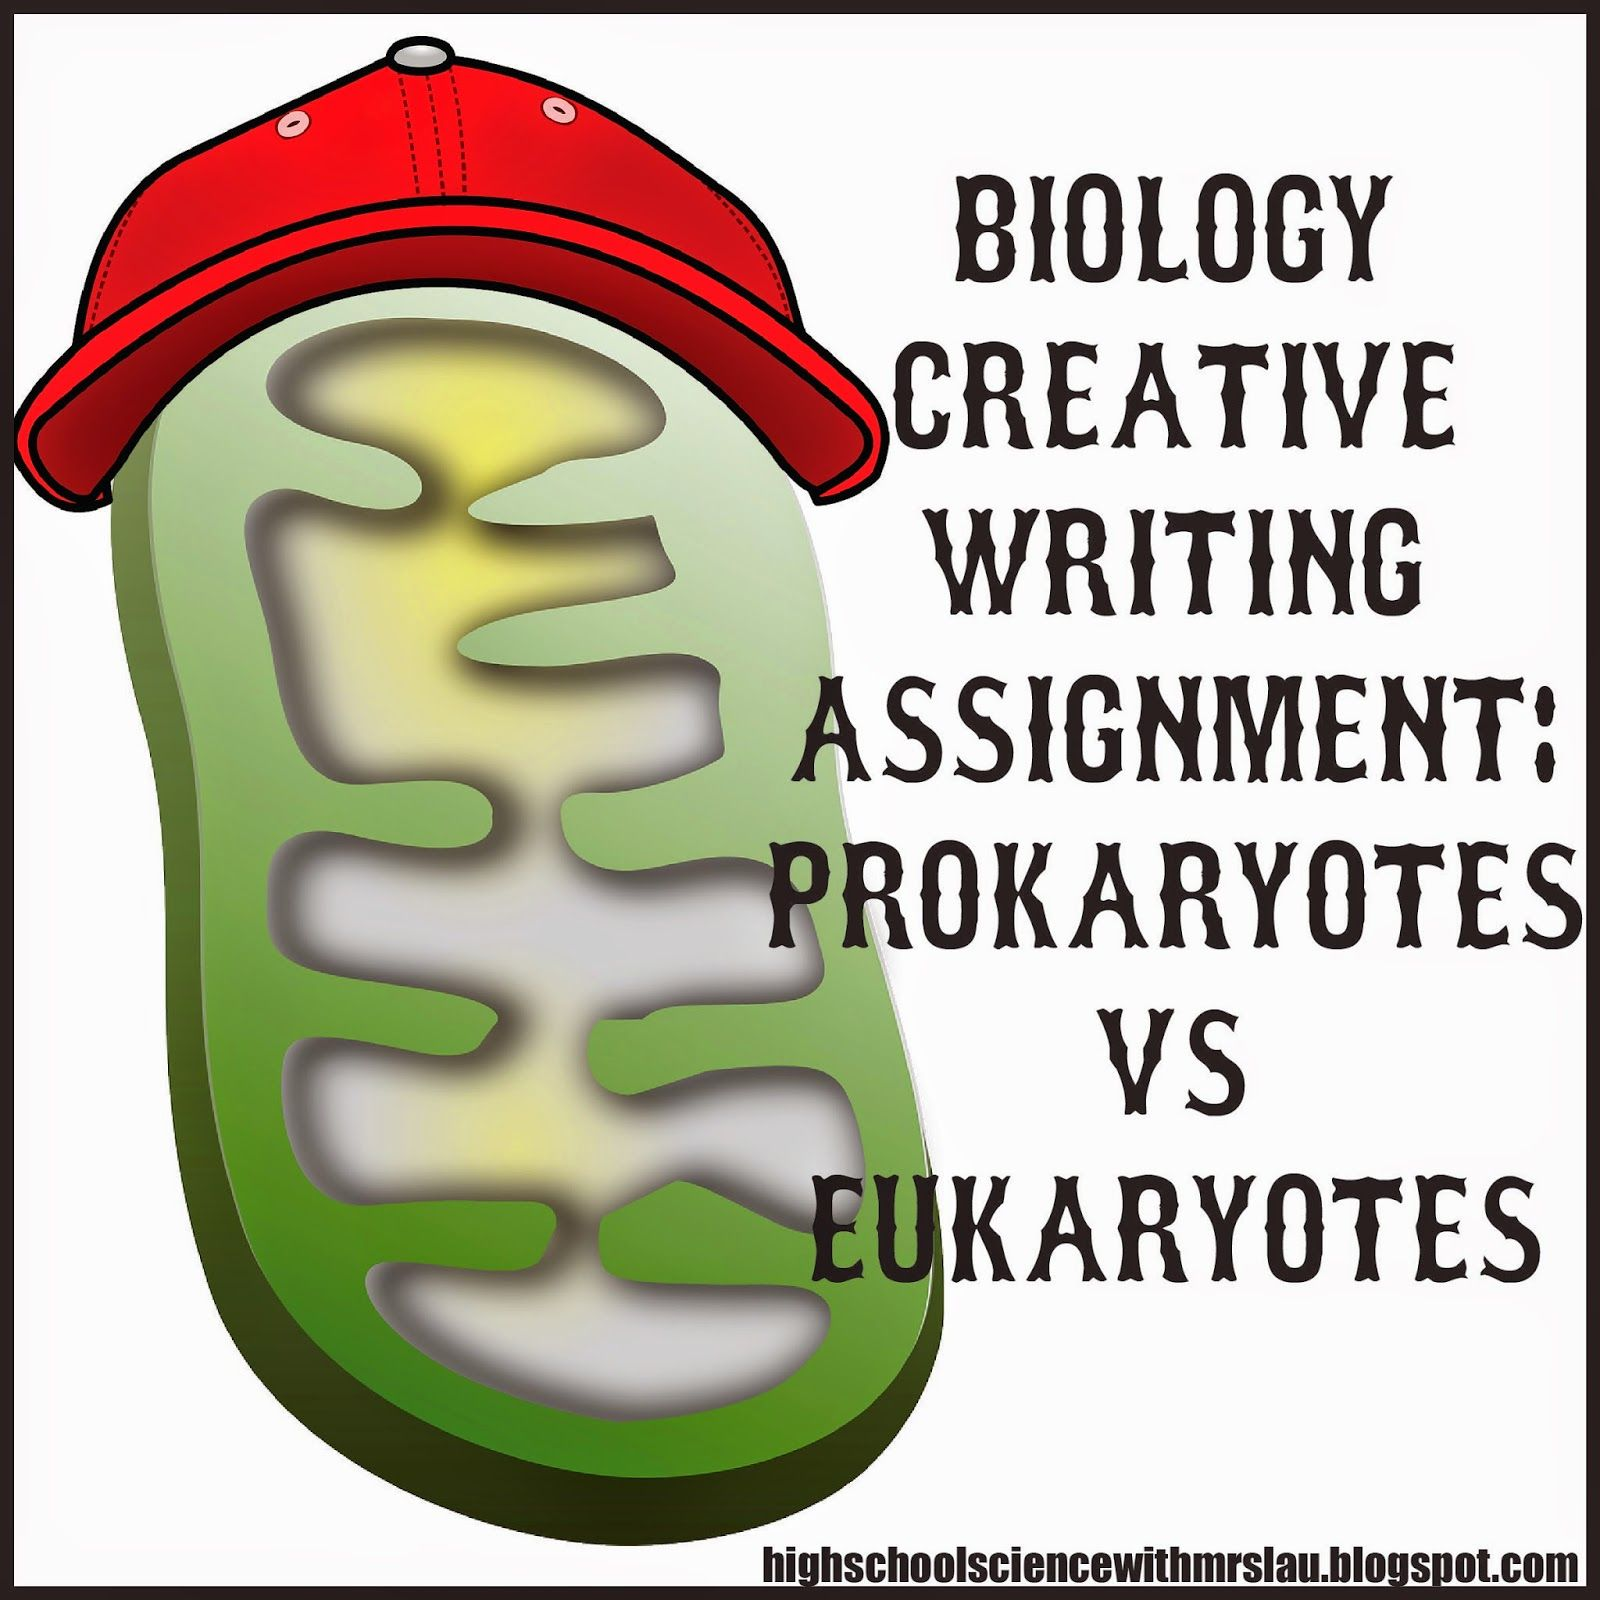 in 9th grade i had an amazing biology teacher ms derosa hill